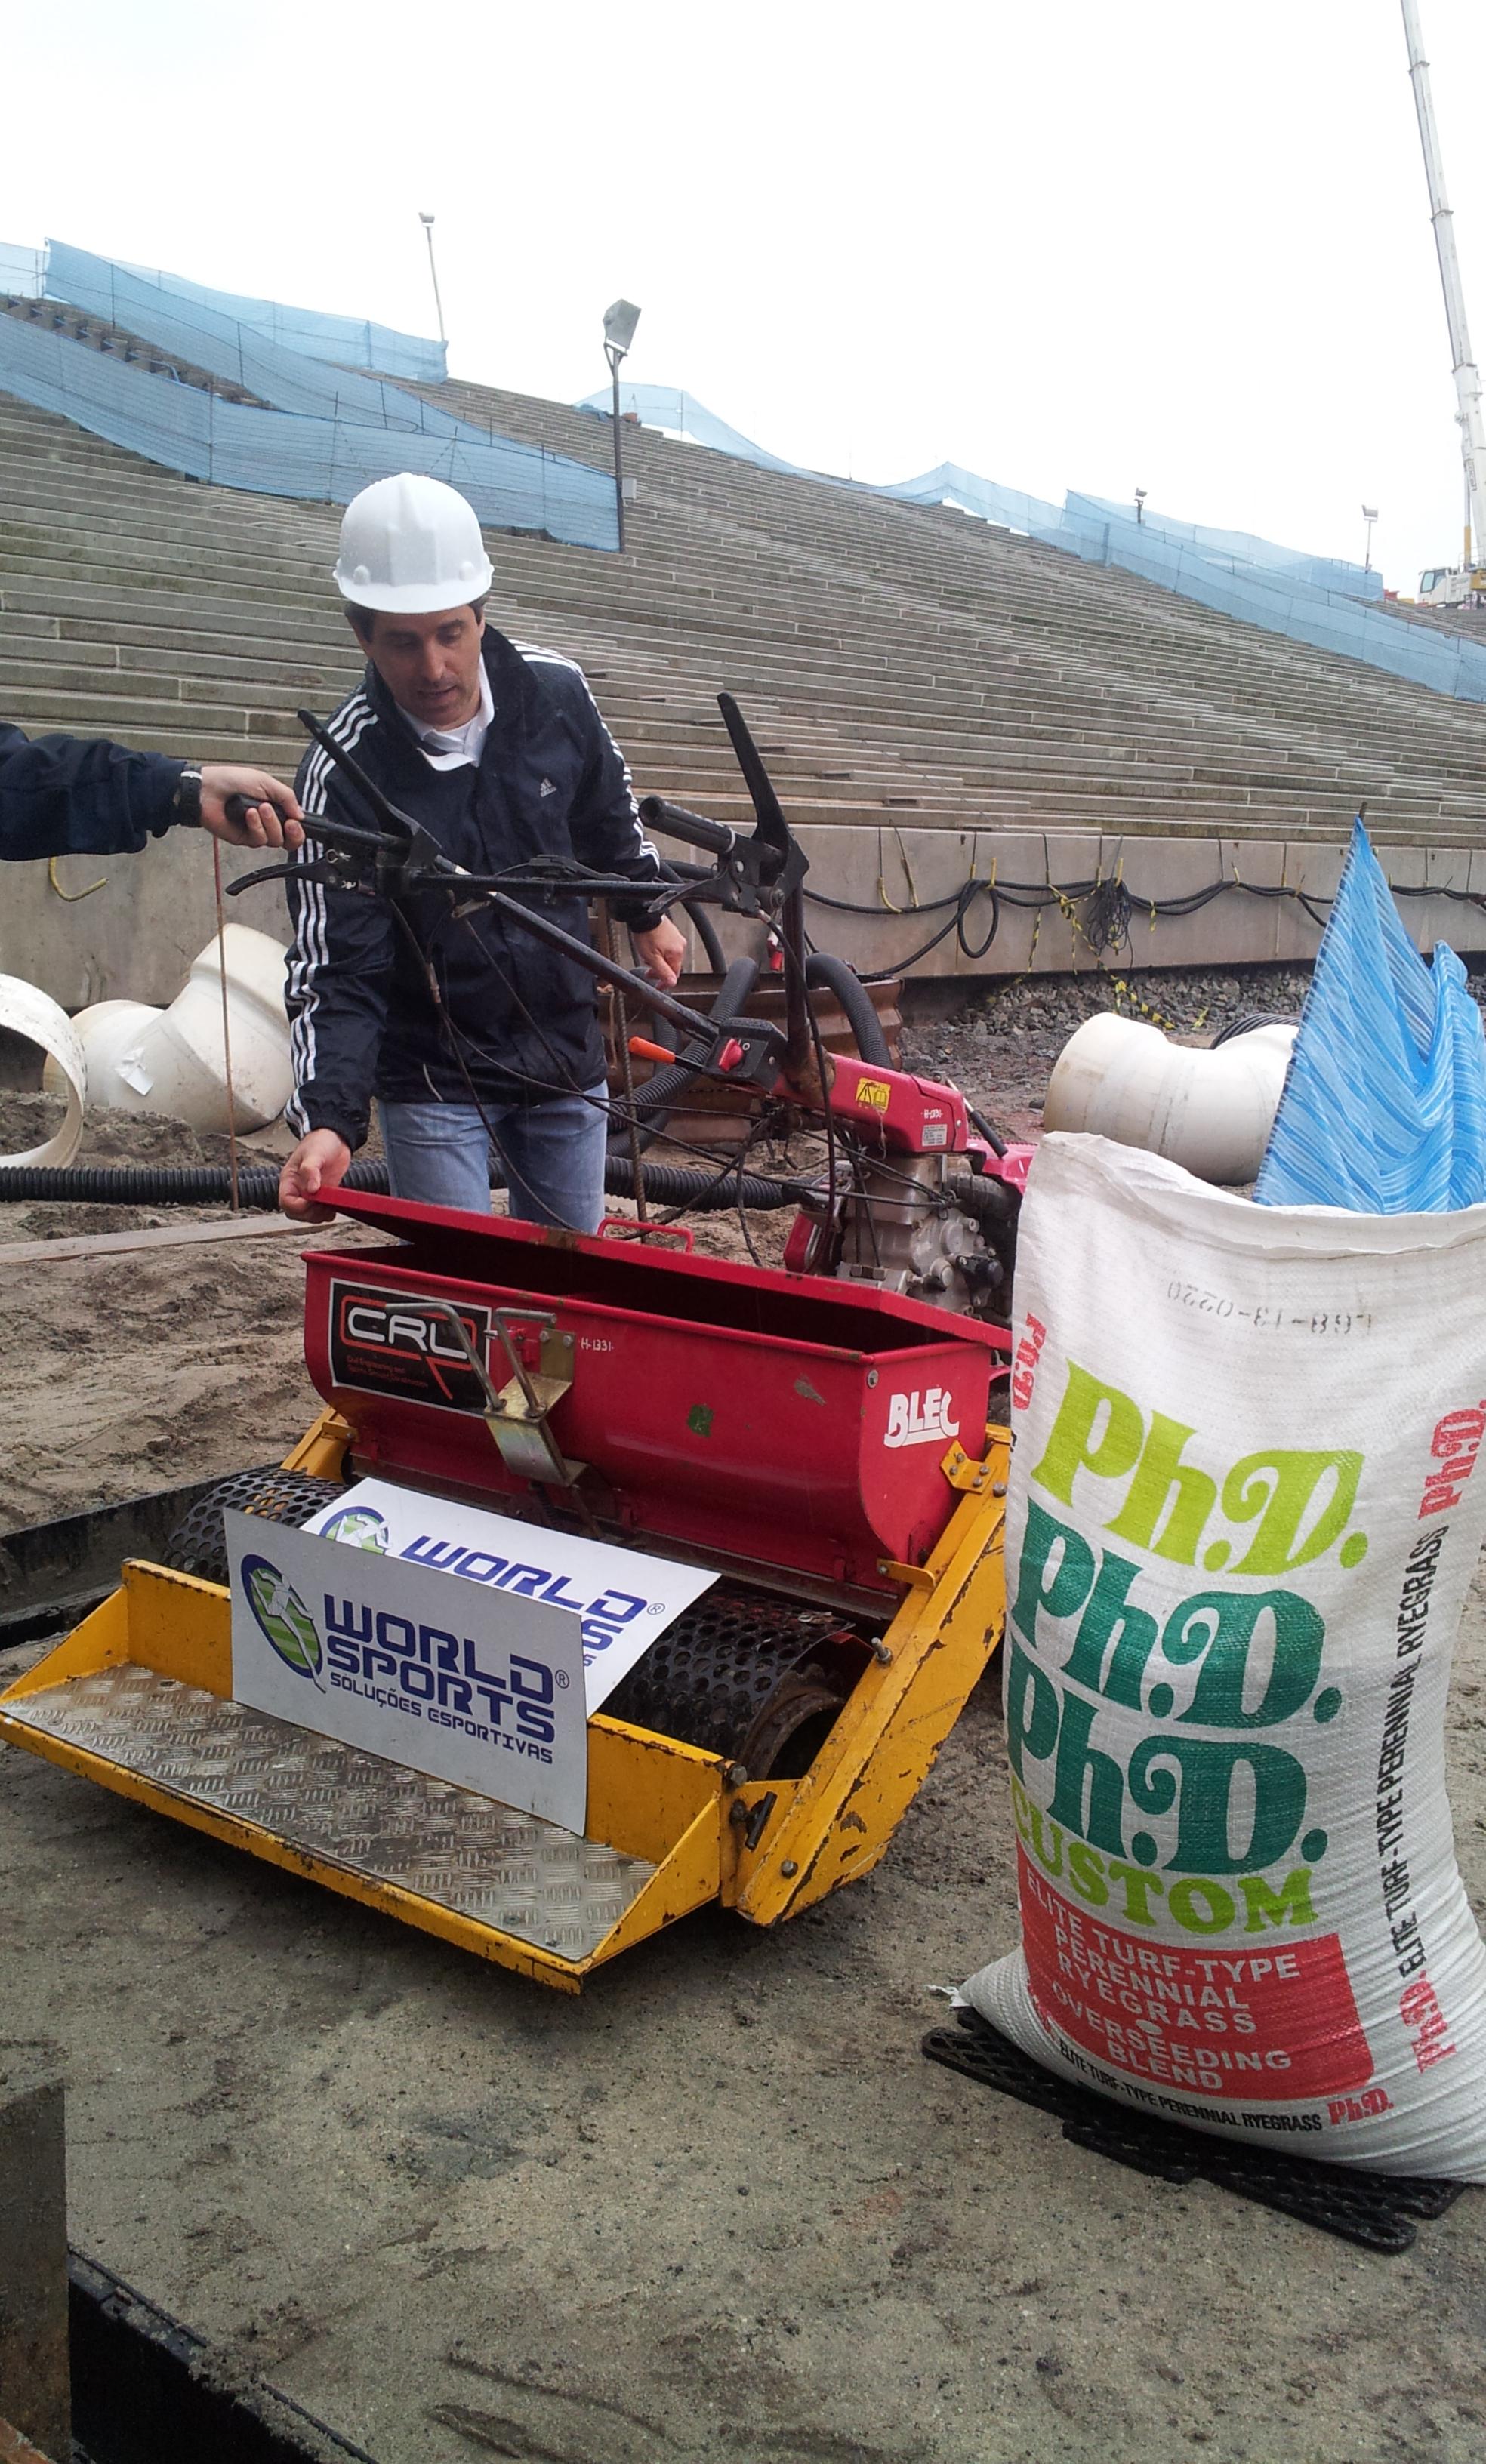 Seeding the pitch